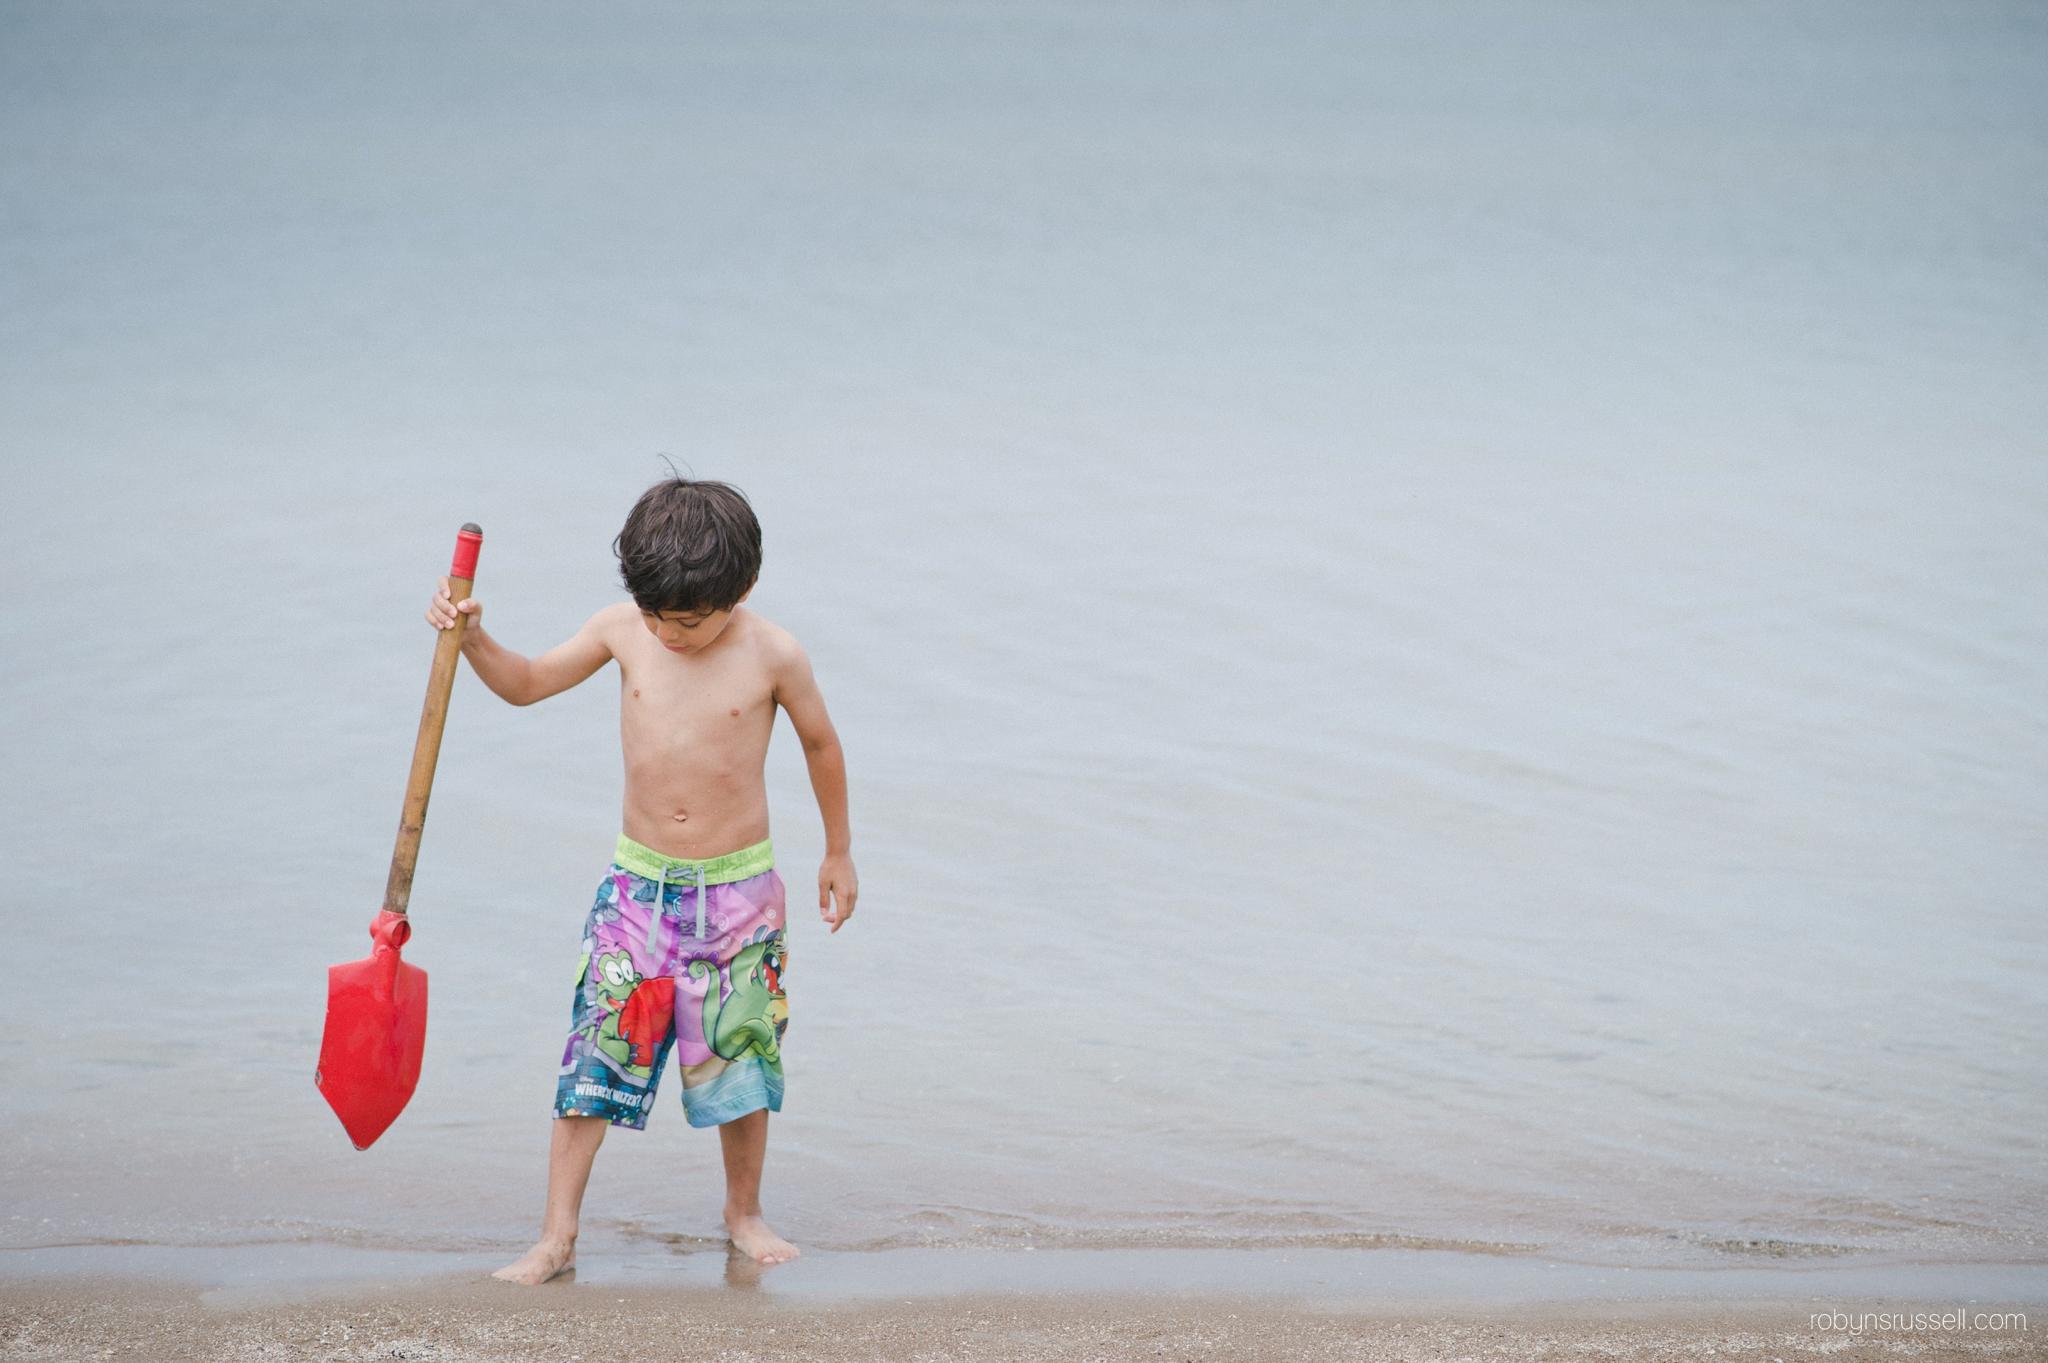 10-boy-with-shovel-at-beach-colllingwood.jpg